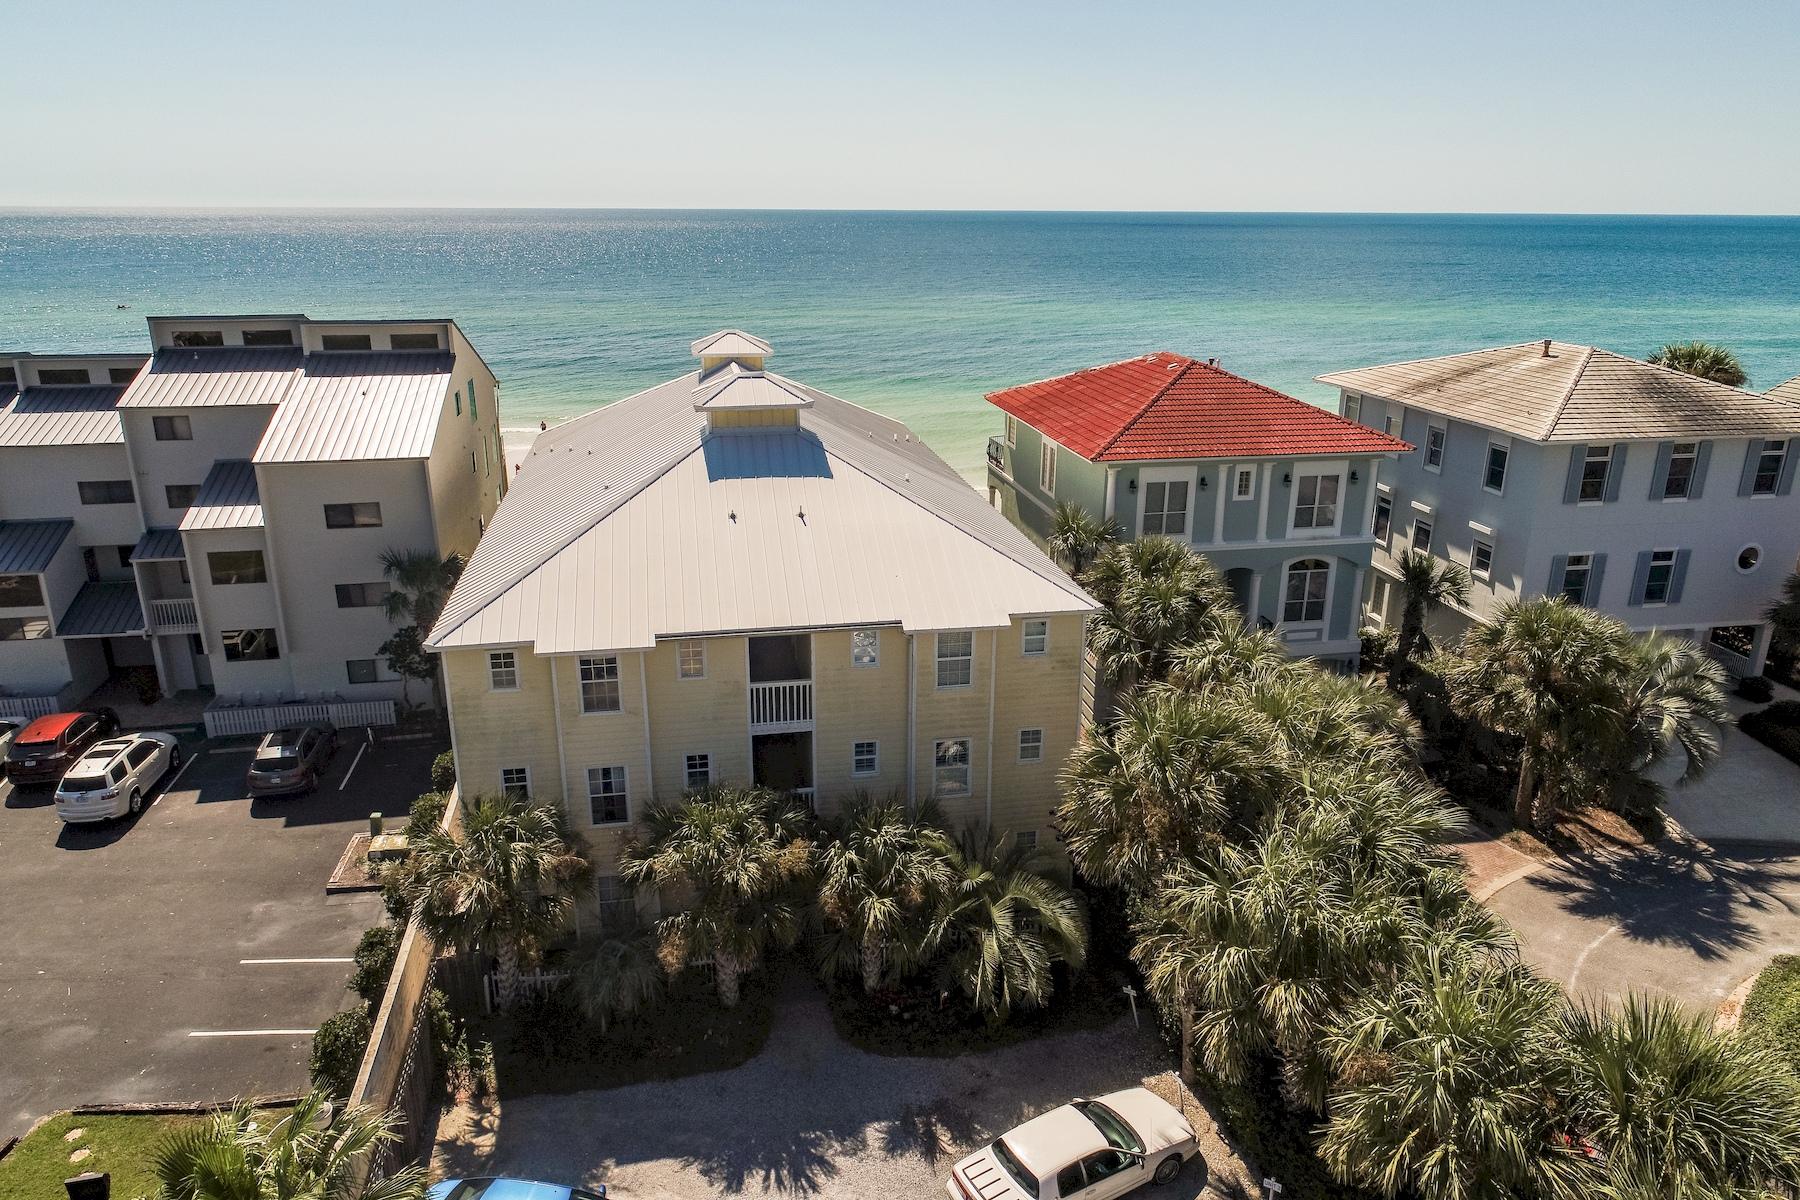 Condominium for Sale at Gulf Front Condo in Private Building in Blue Mountain Beach 178 Blue Mountain Road Unit 9, Santa Rosa Beach, Florida, 32459 United States